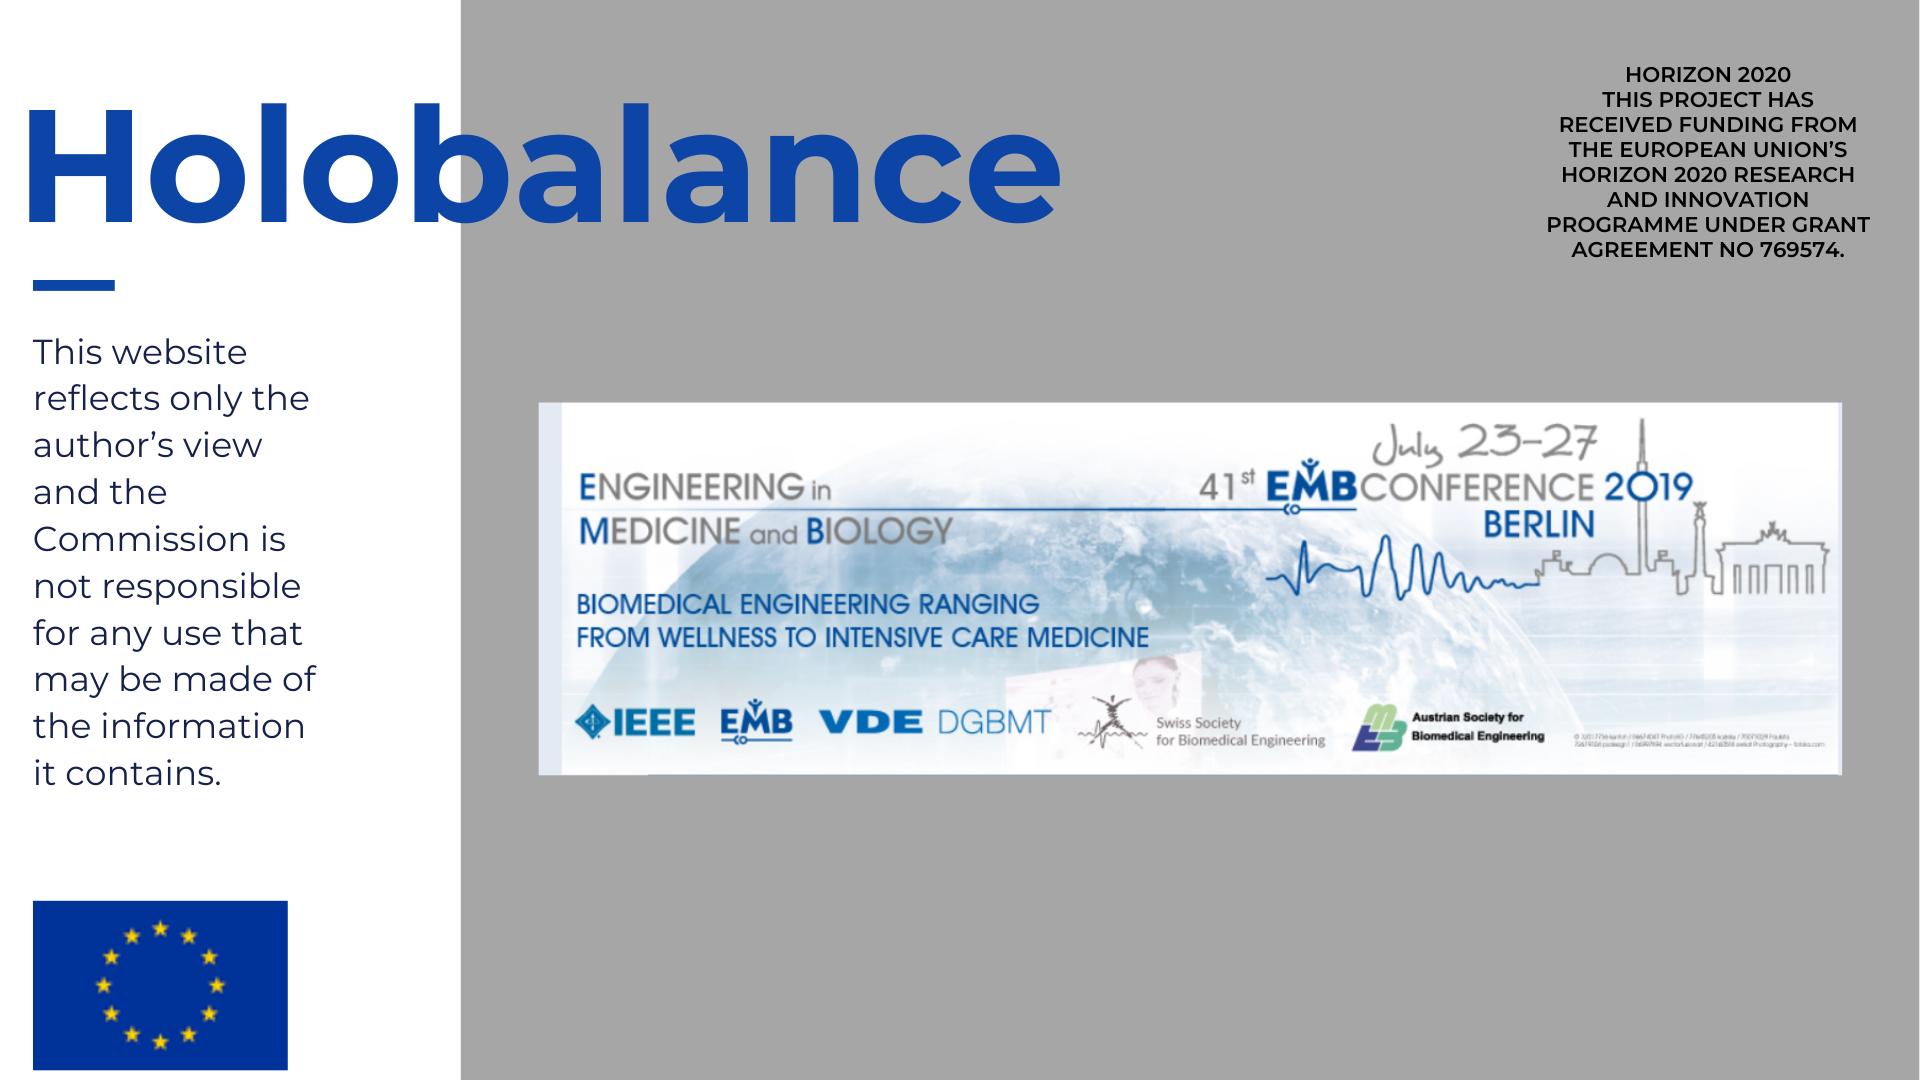 Holobalance, Horizon 2020 on EMBC